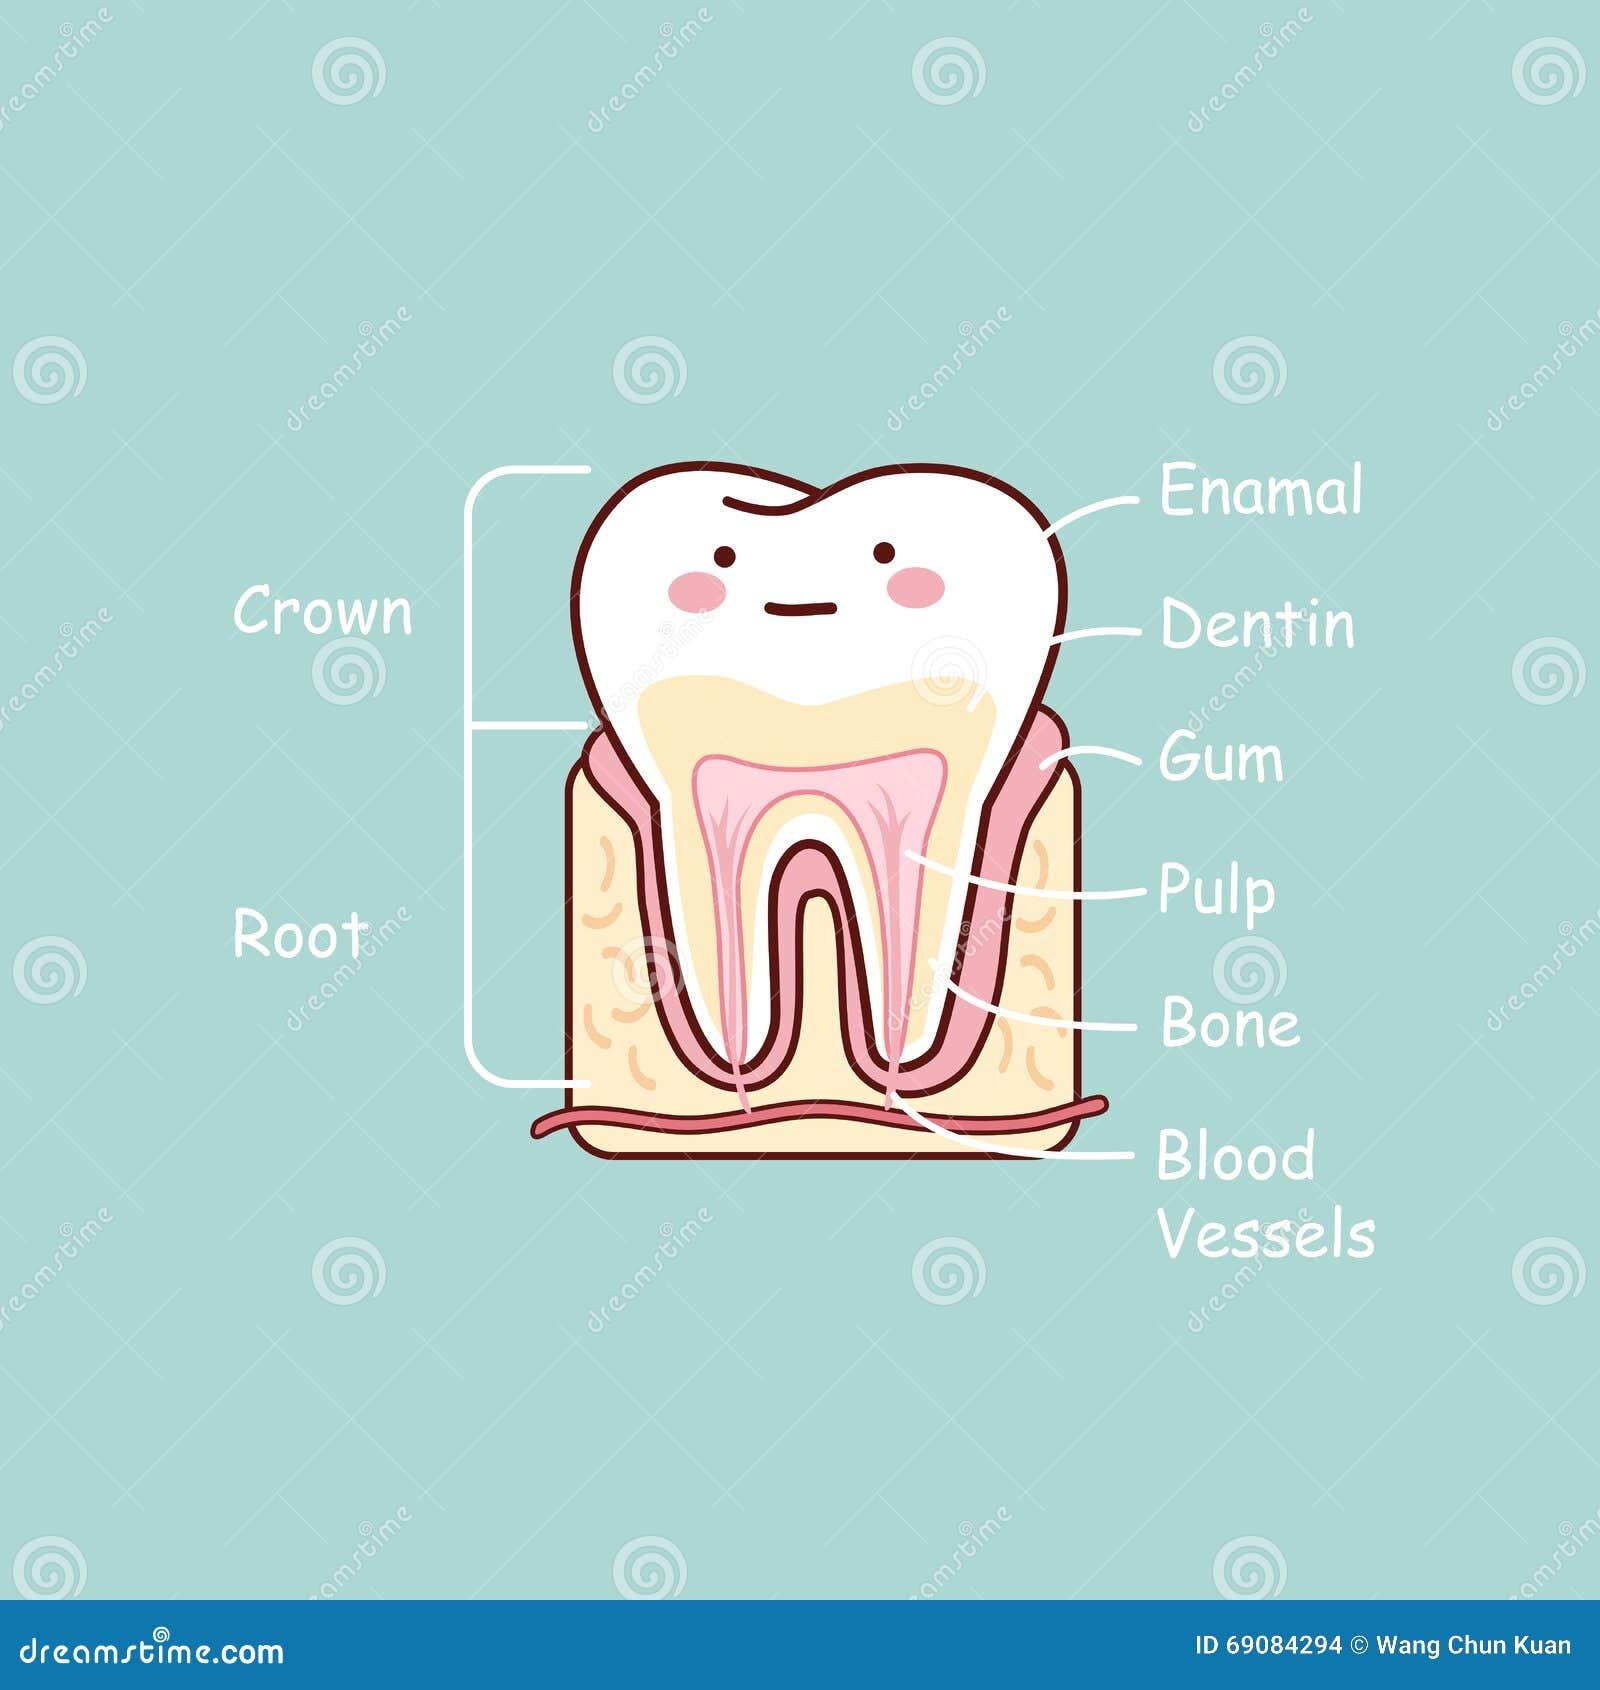 Vecteur clipart de main sur 201 cologie conscience image concept - Cartoon Illustration Of Human Neuron Anatomy Stock Vector Image Cartoon Tooth Anatomy Chart Stock Images Monardofo